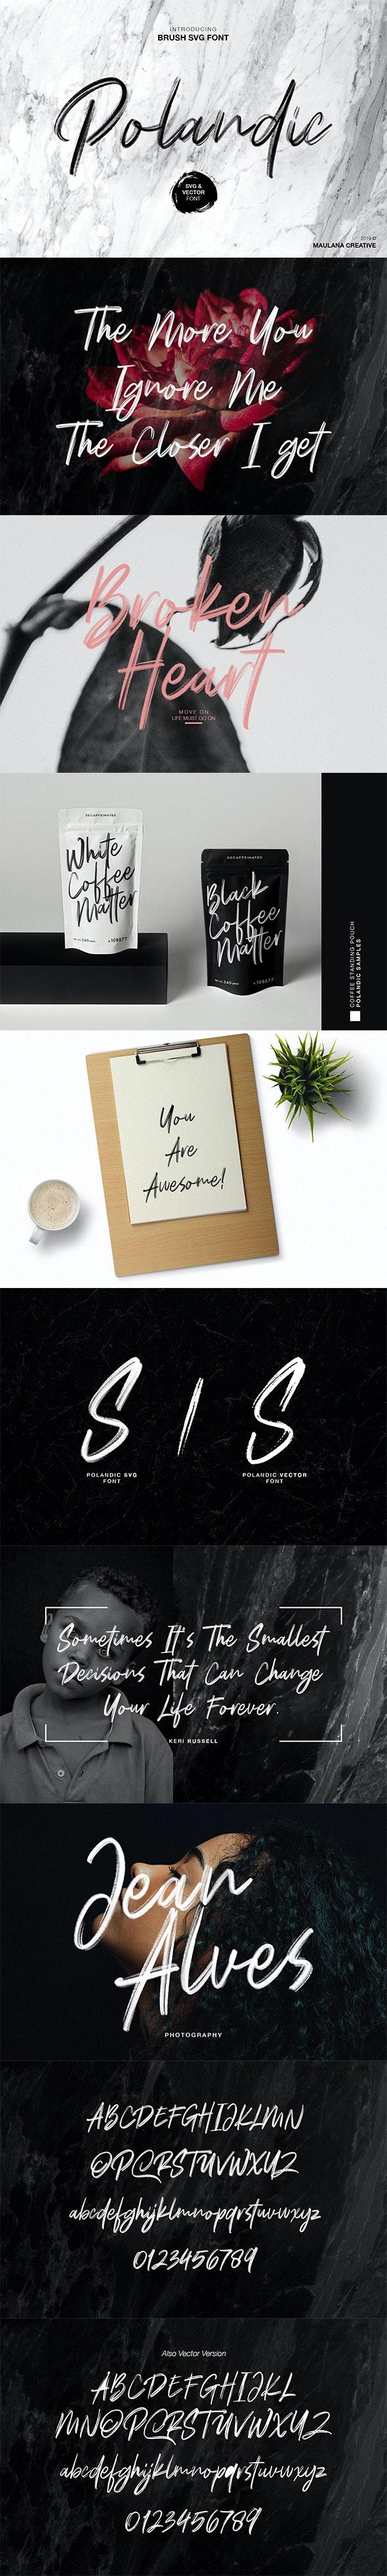 Polandic SVG Brush Font - Hand-writing Script